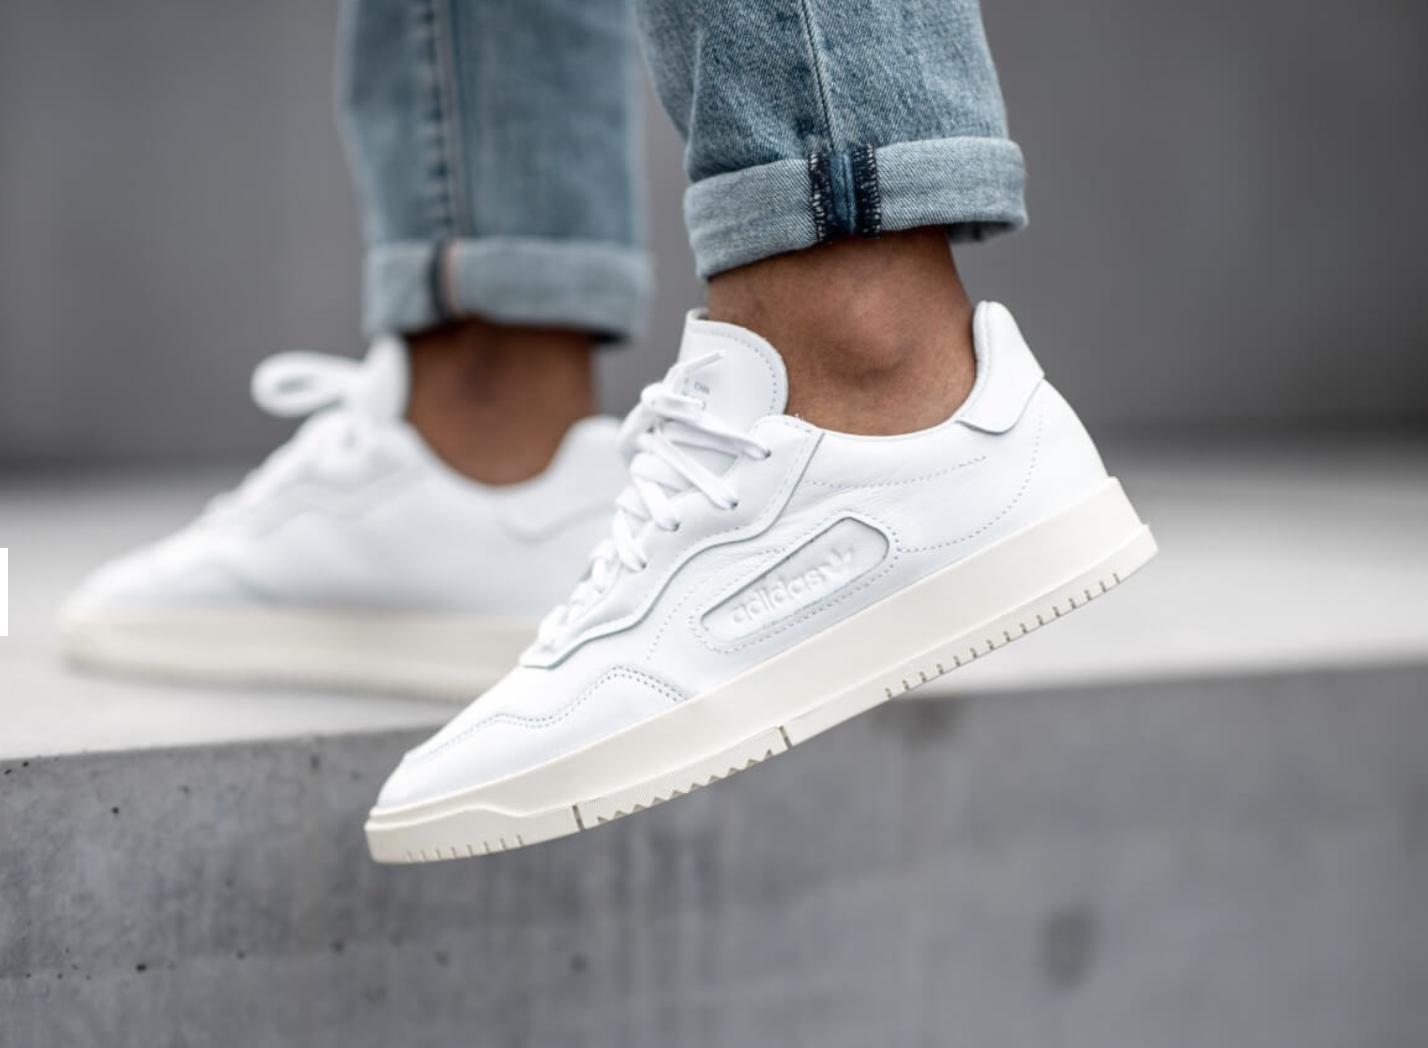 Adidas ORIGINALS SC PREMIERE in 2020 | Sneakers mode ...